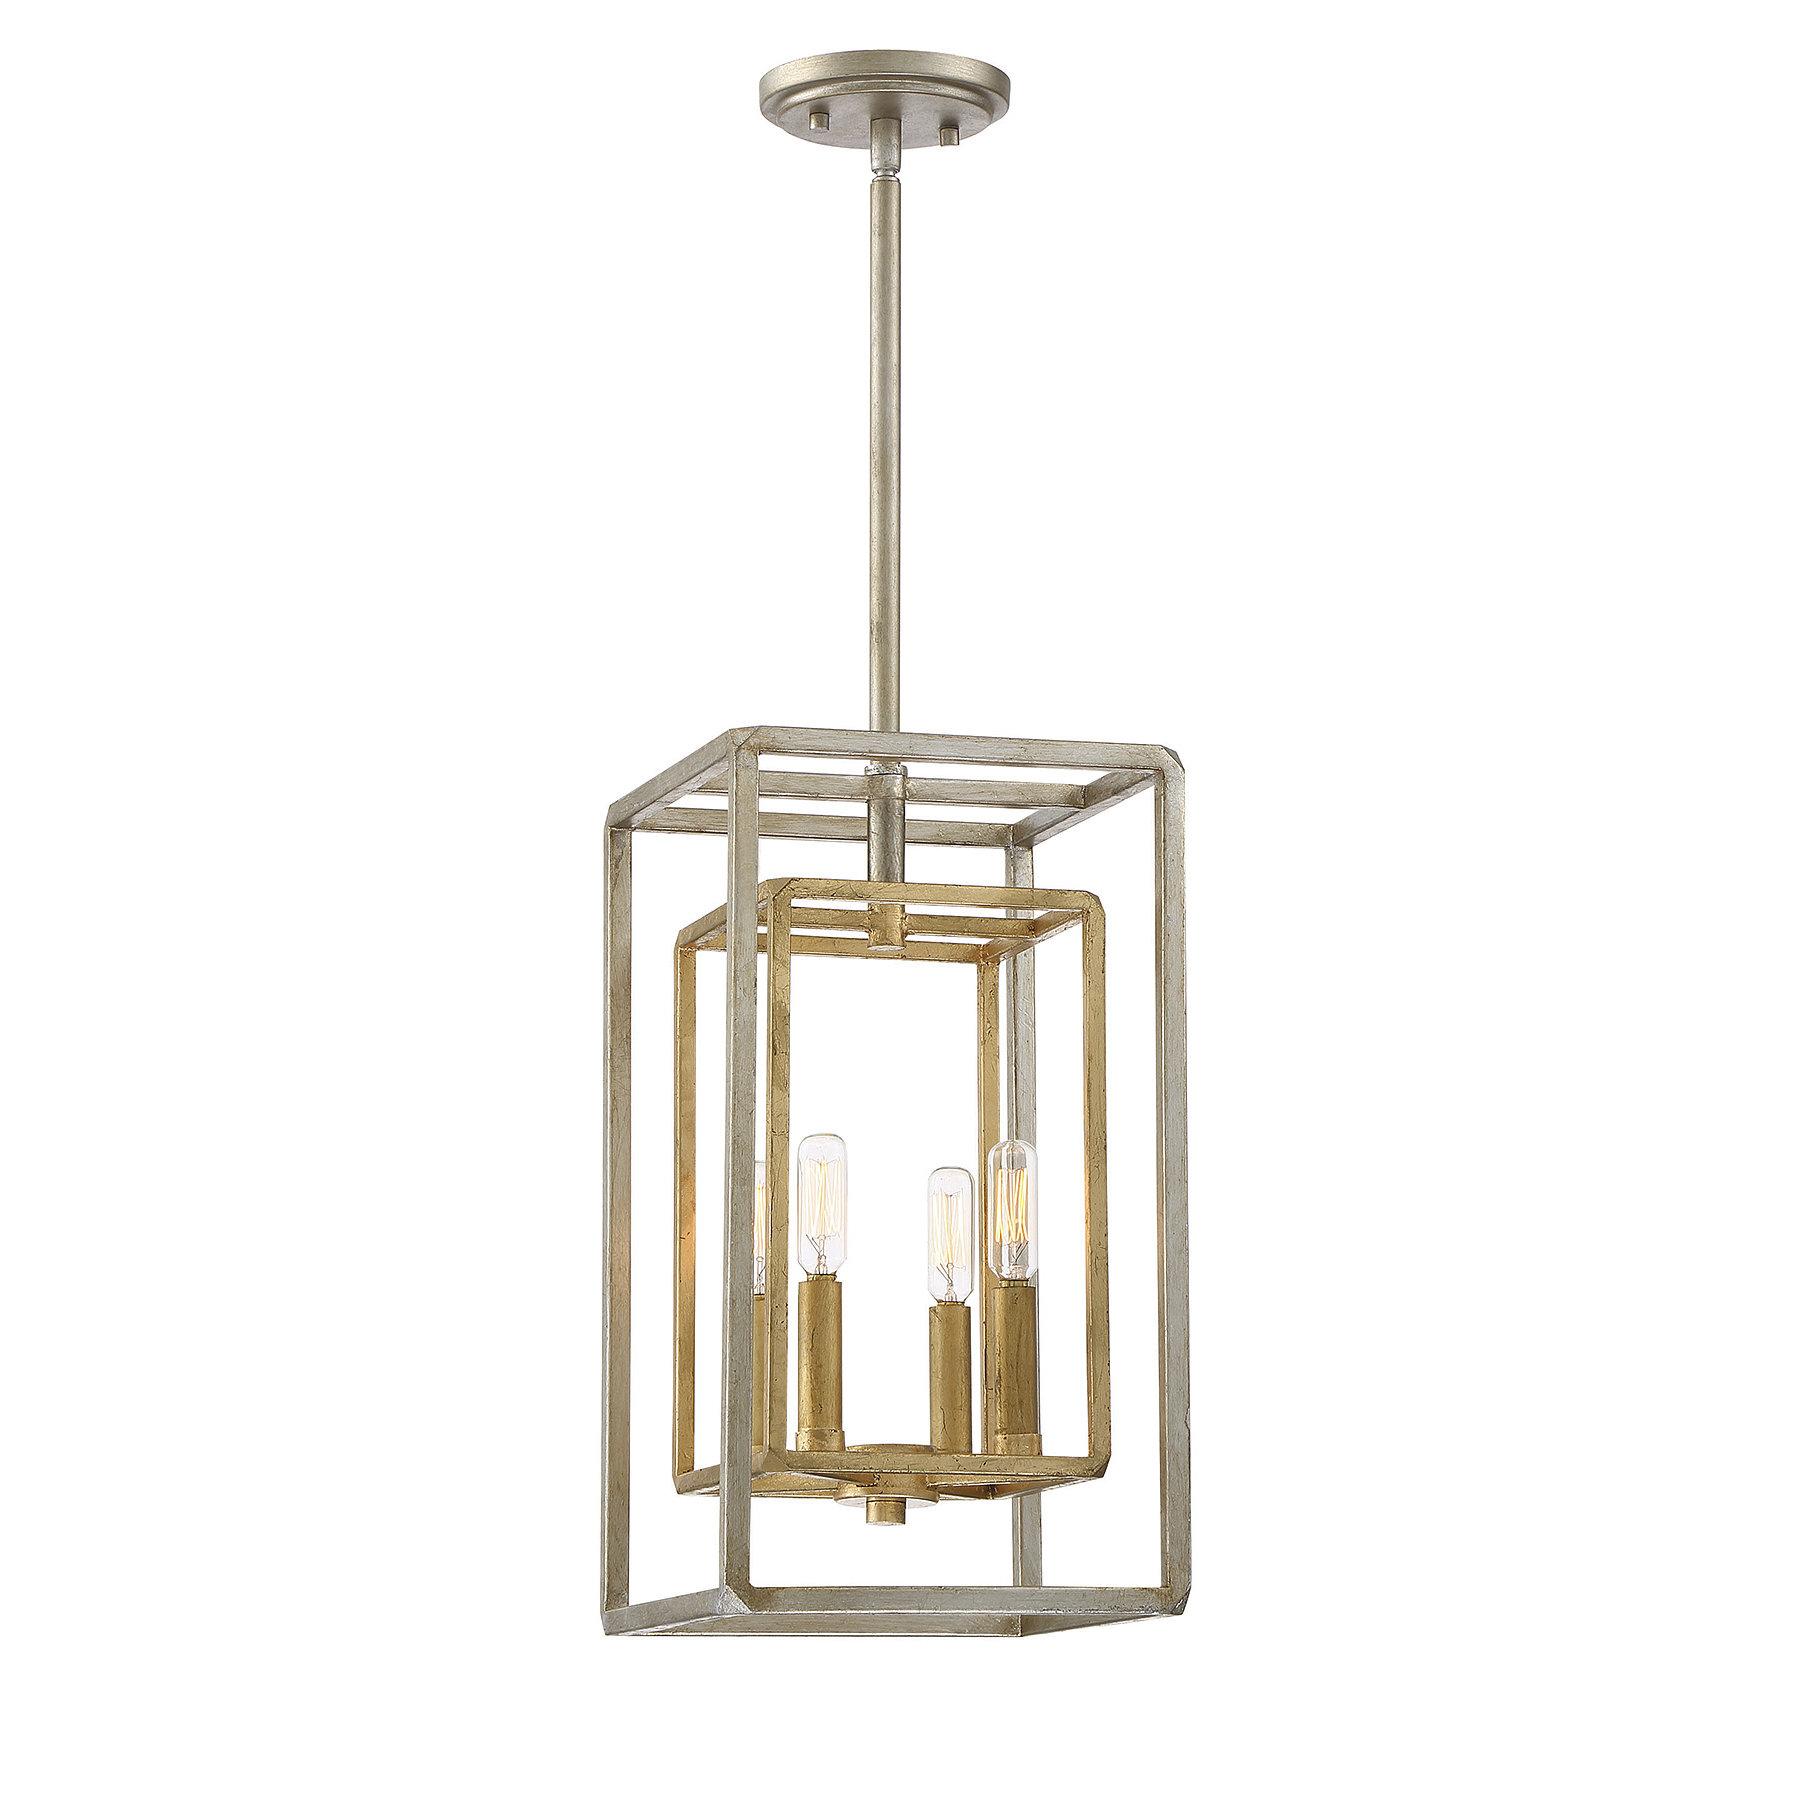 Eglantina 4 Light Lantern Square / Rectangle Pendant For 4 Light Lantern Square / Rectangle Pendants (Gallery 15 of 30)